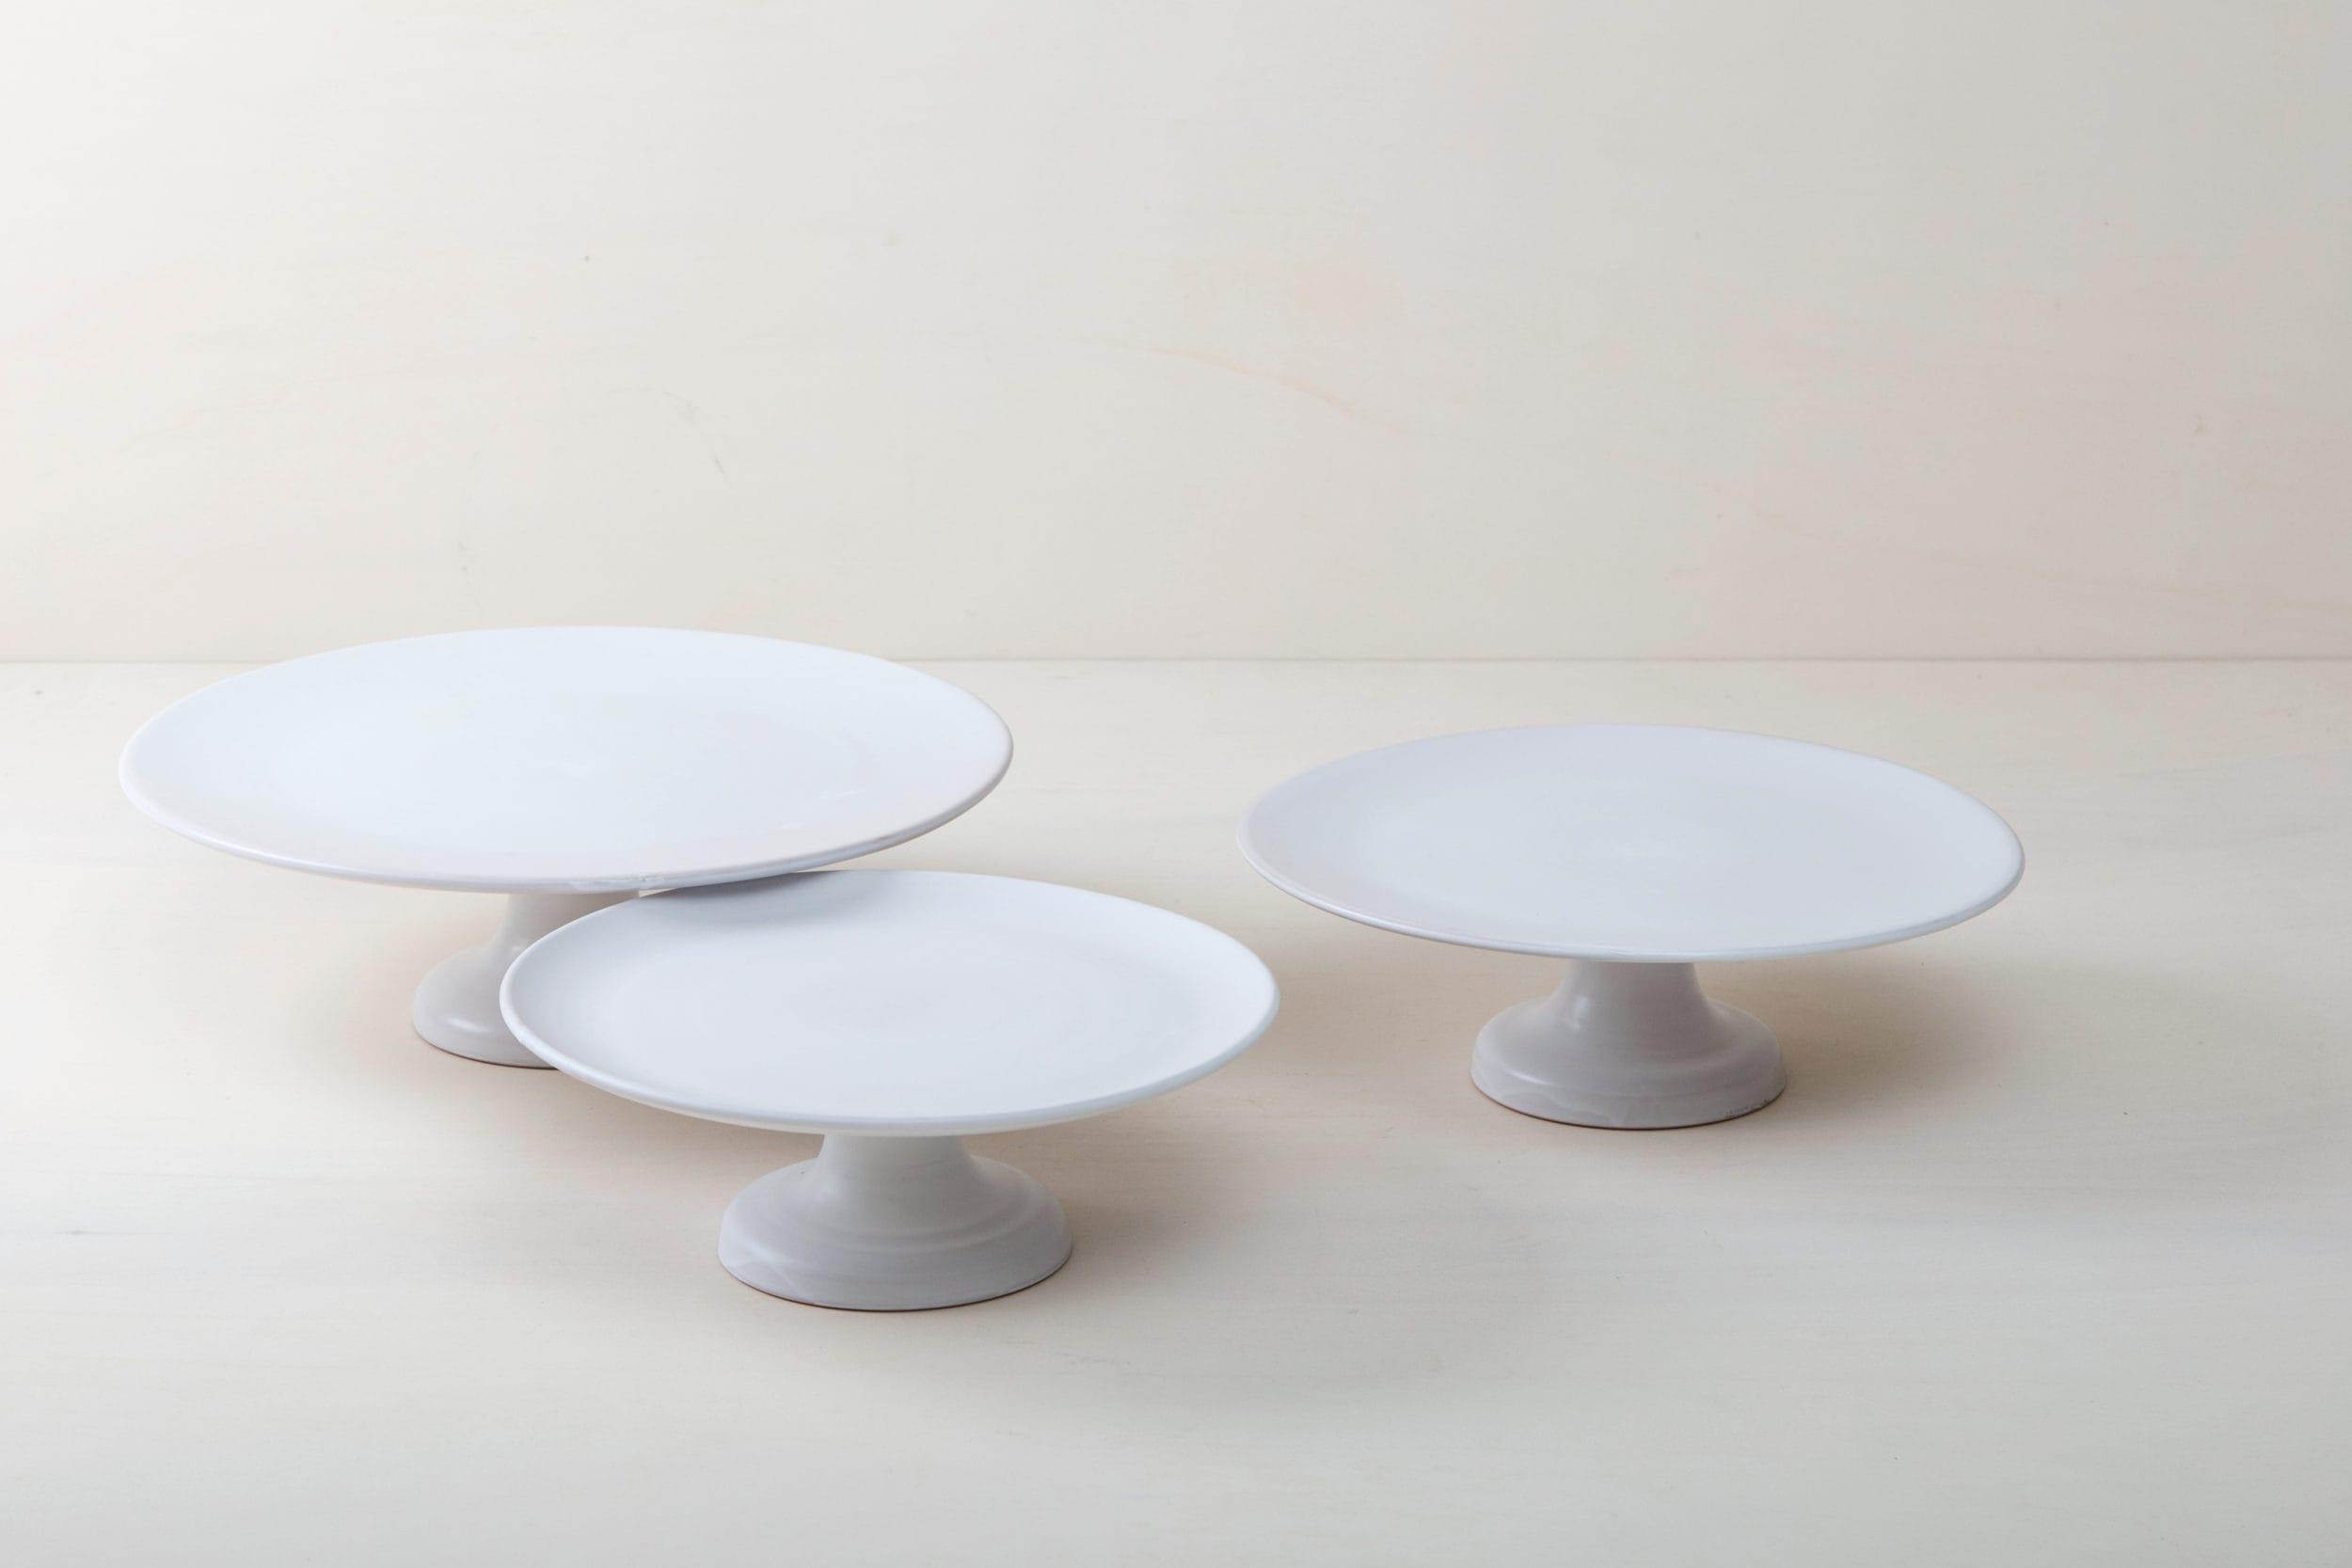 Geschirrverleih, Buffetsubehör, Cateringbedarf & weiße Servierplatten